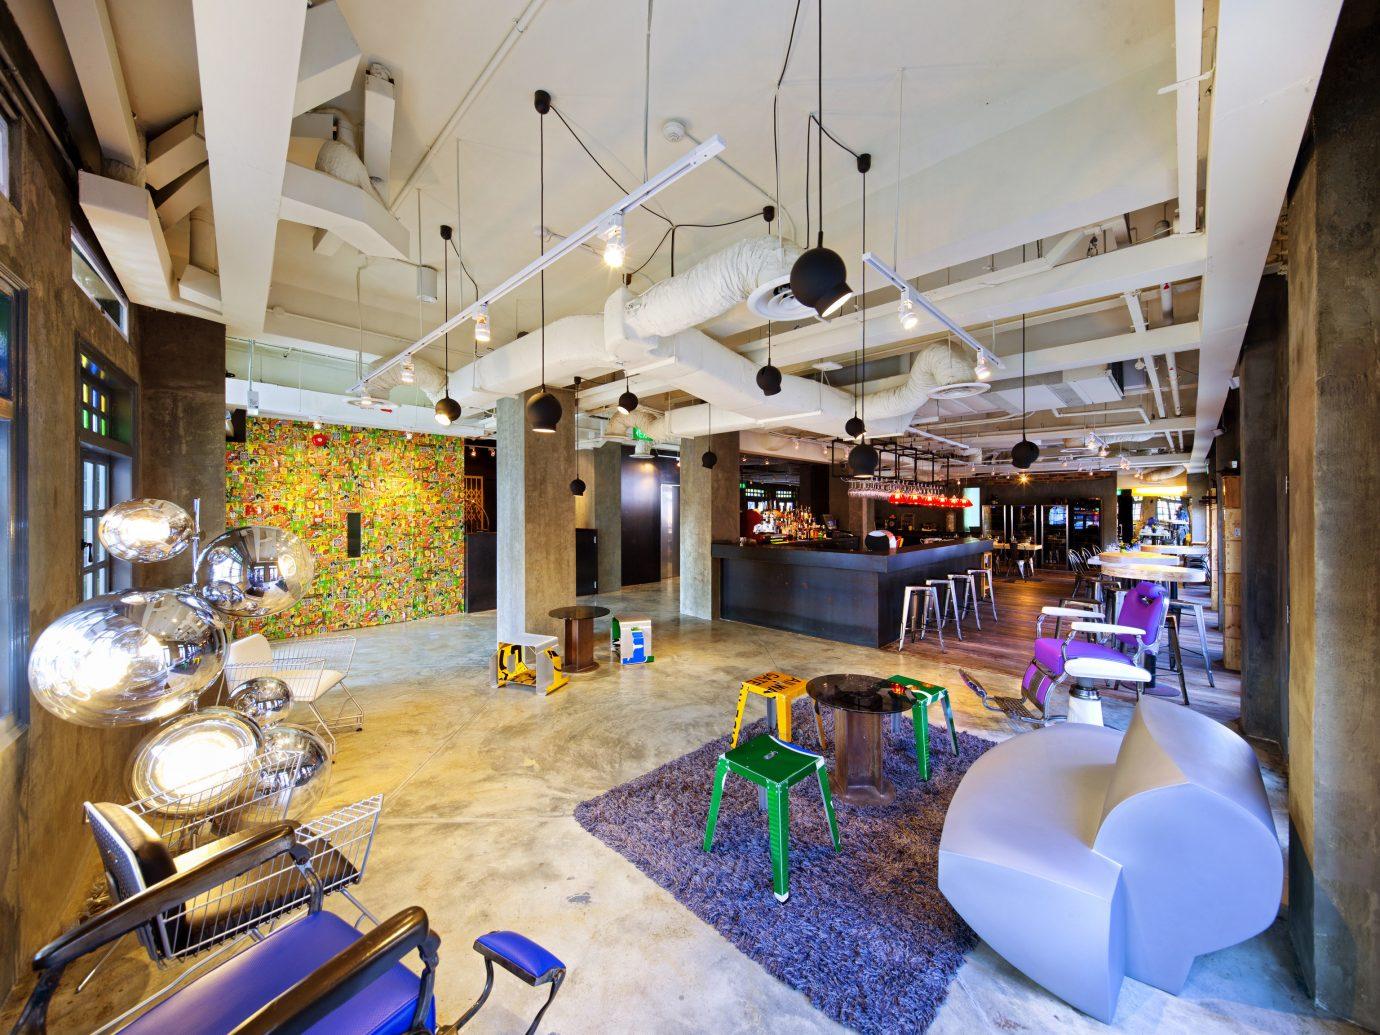 Budget room building estate home interior design Lobby Resort Design restaurant mansion